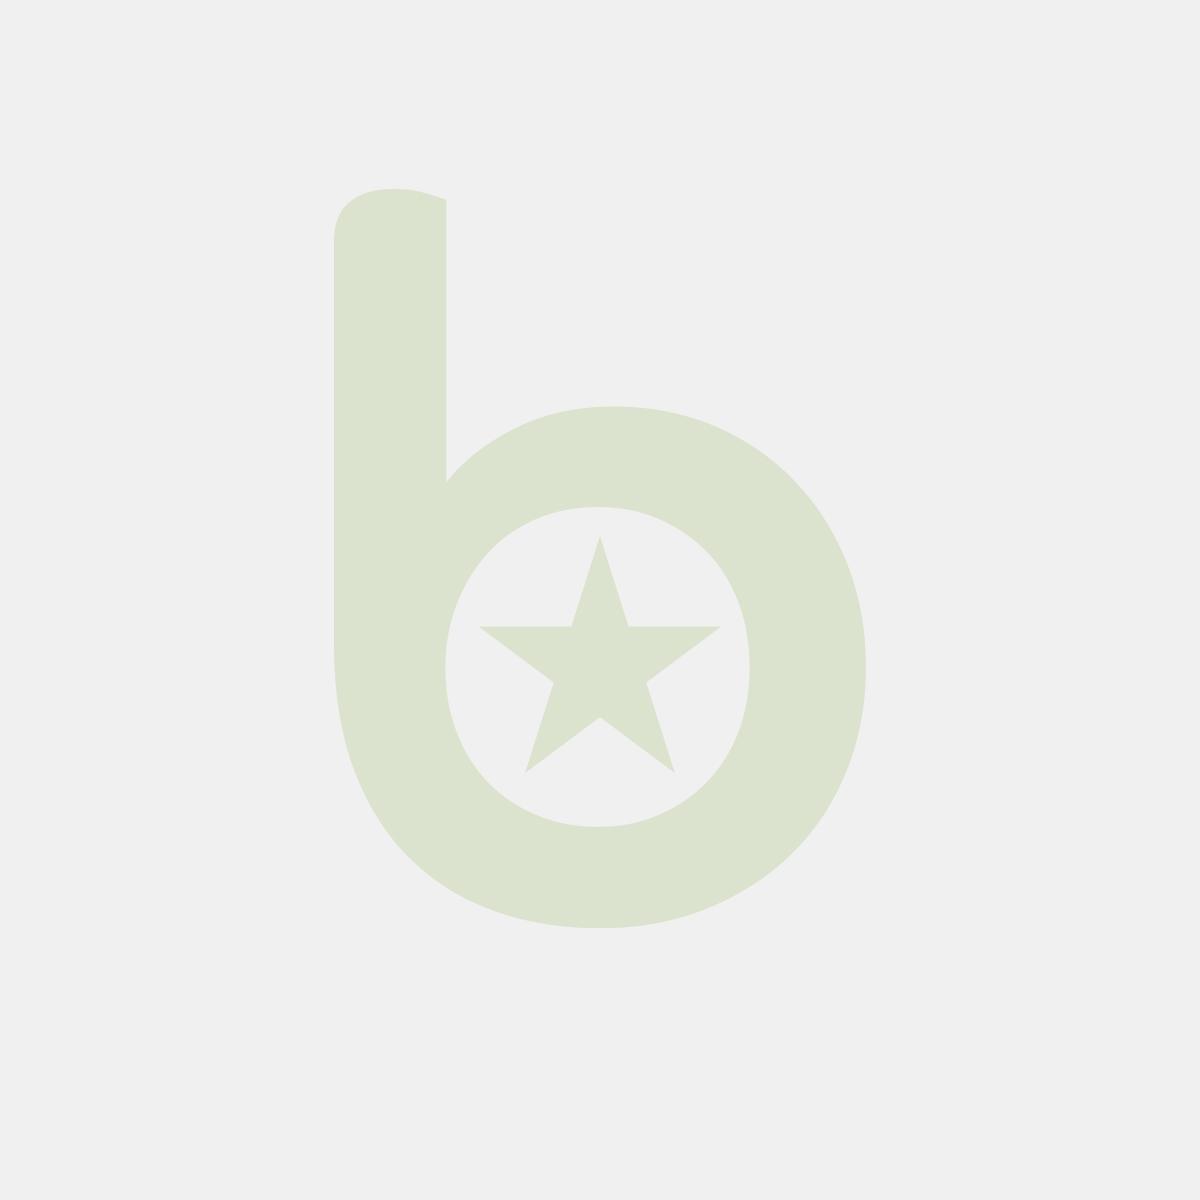 Cienkopis SCHNEIDER Line-Up, 0,4mm, jasnobrązowy